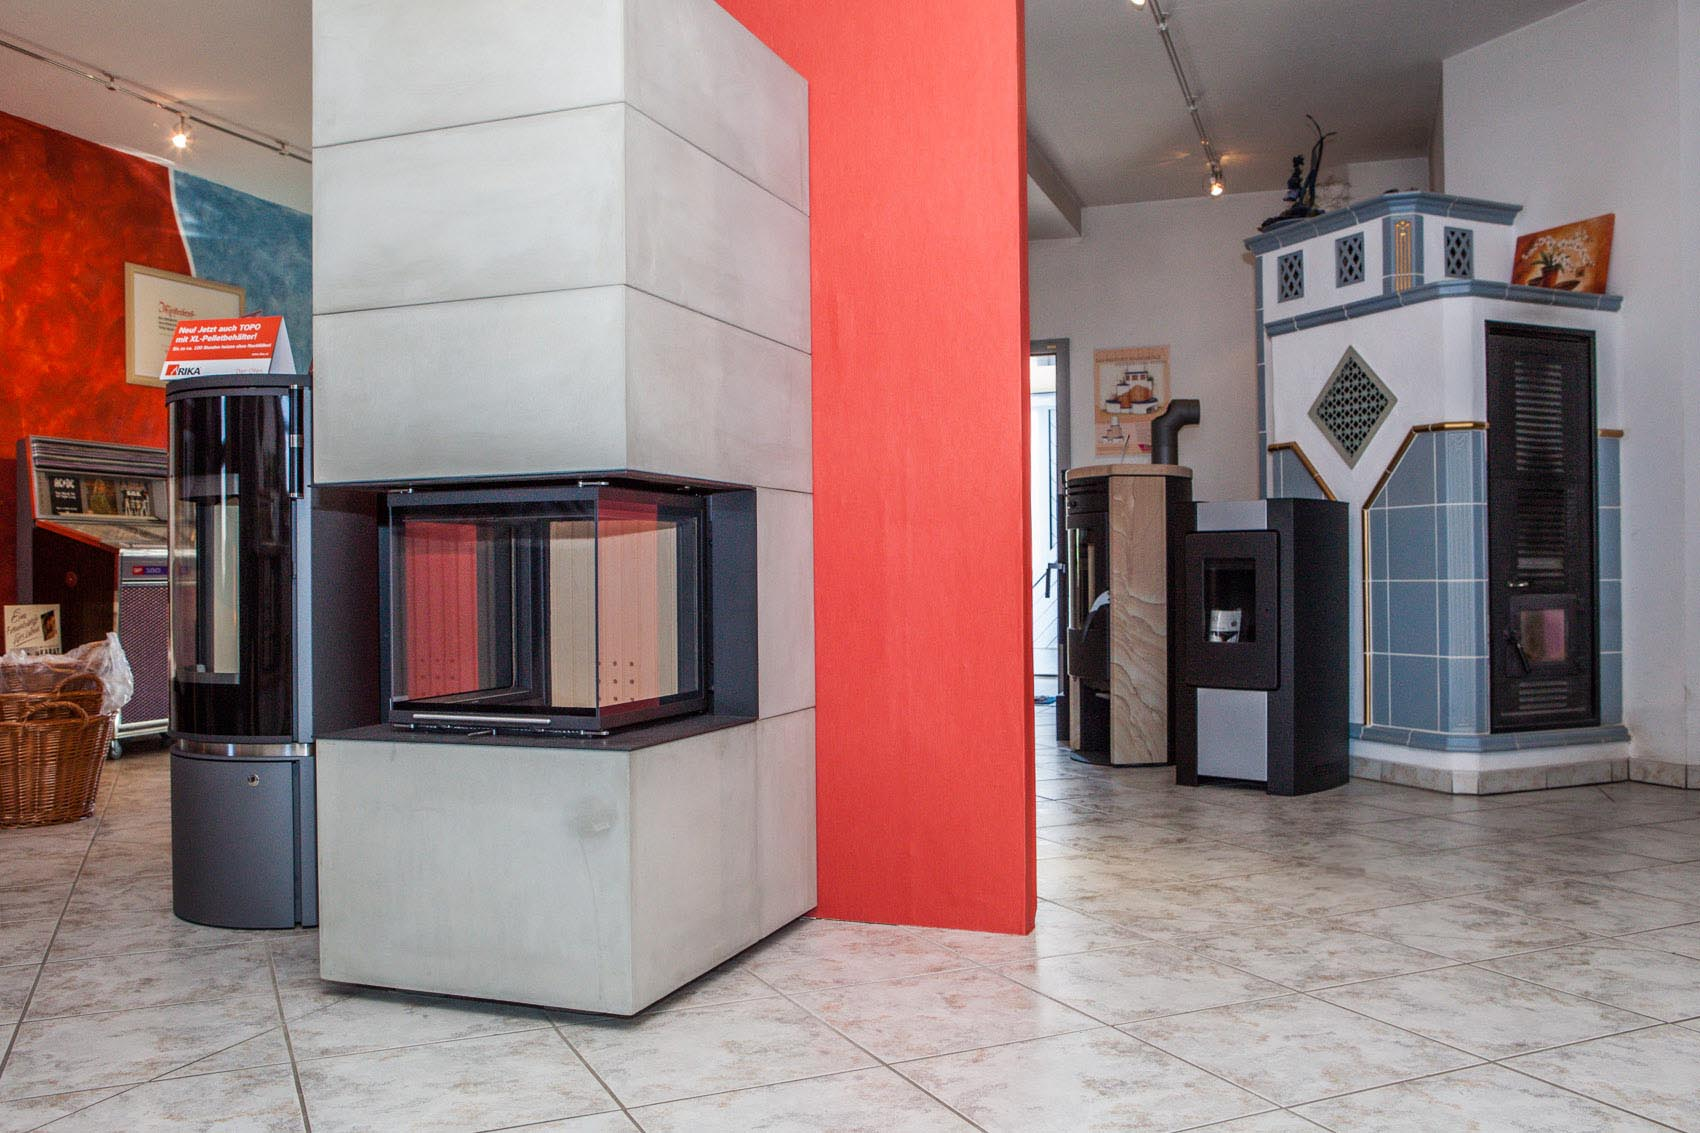 schmitt kachelofenbau aus ebersburg bei fulda kaminofen. Black Bedroom Furniture Sets. Home Design Ideas